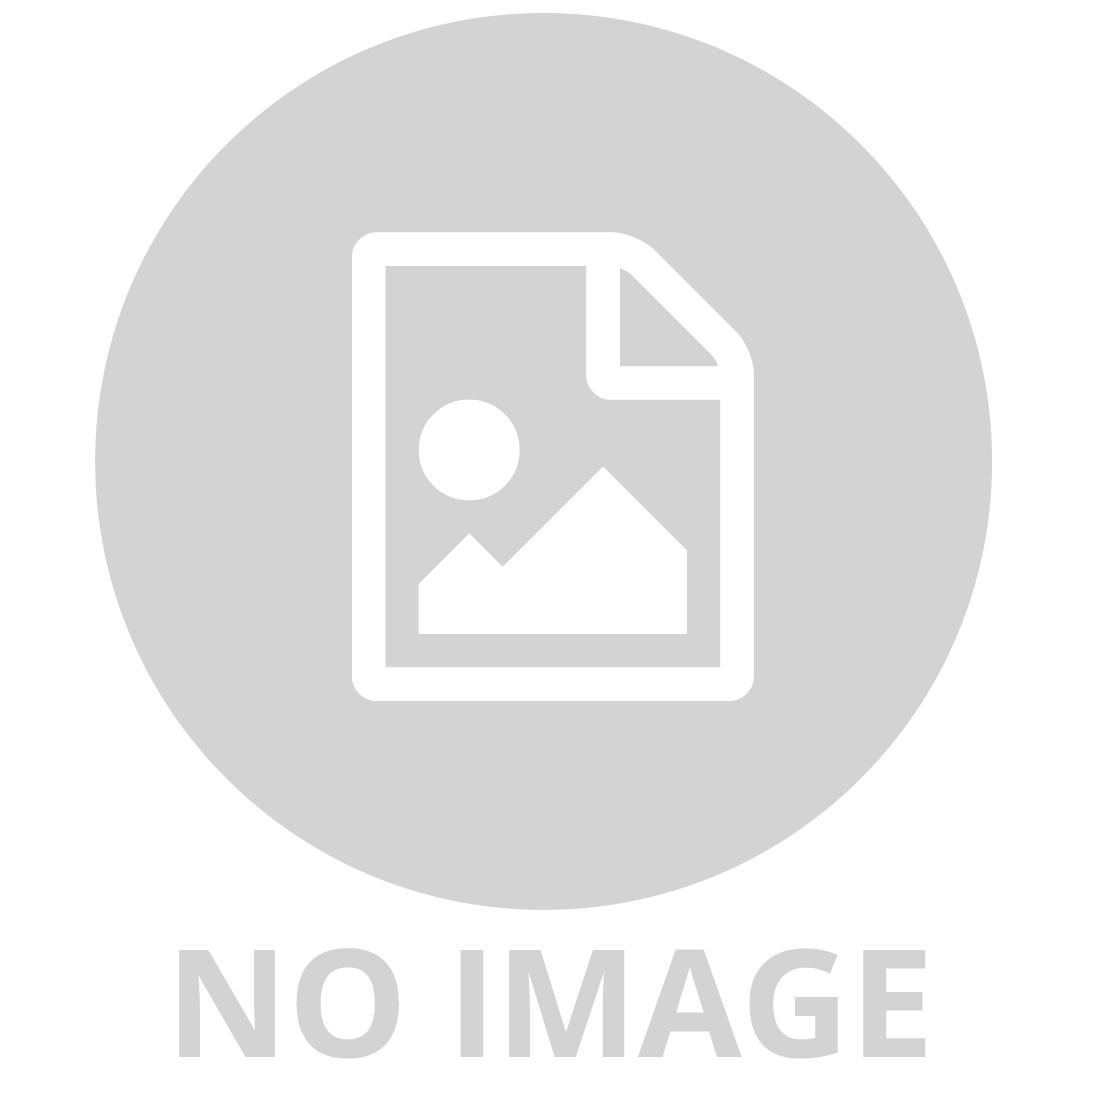 LEGO CREATION- MODULAR SKATE HOUSE 31081